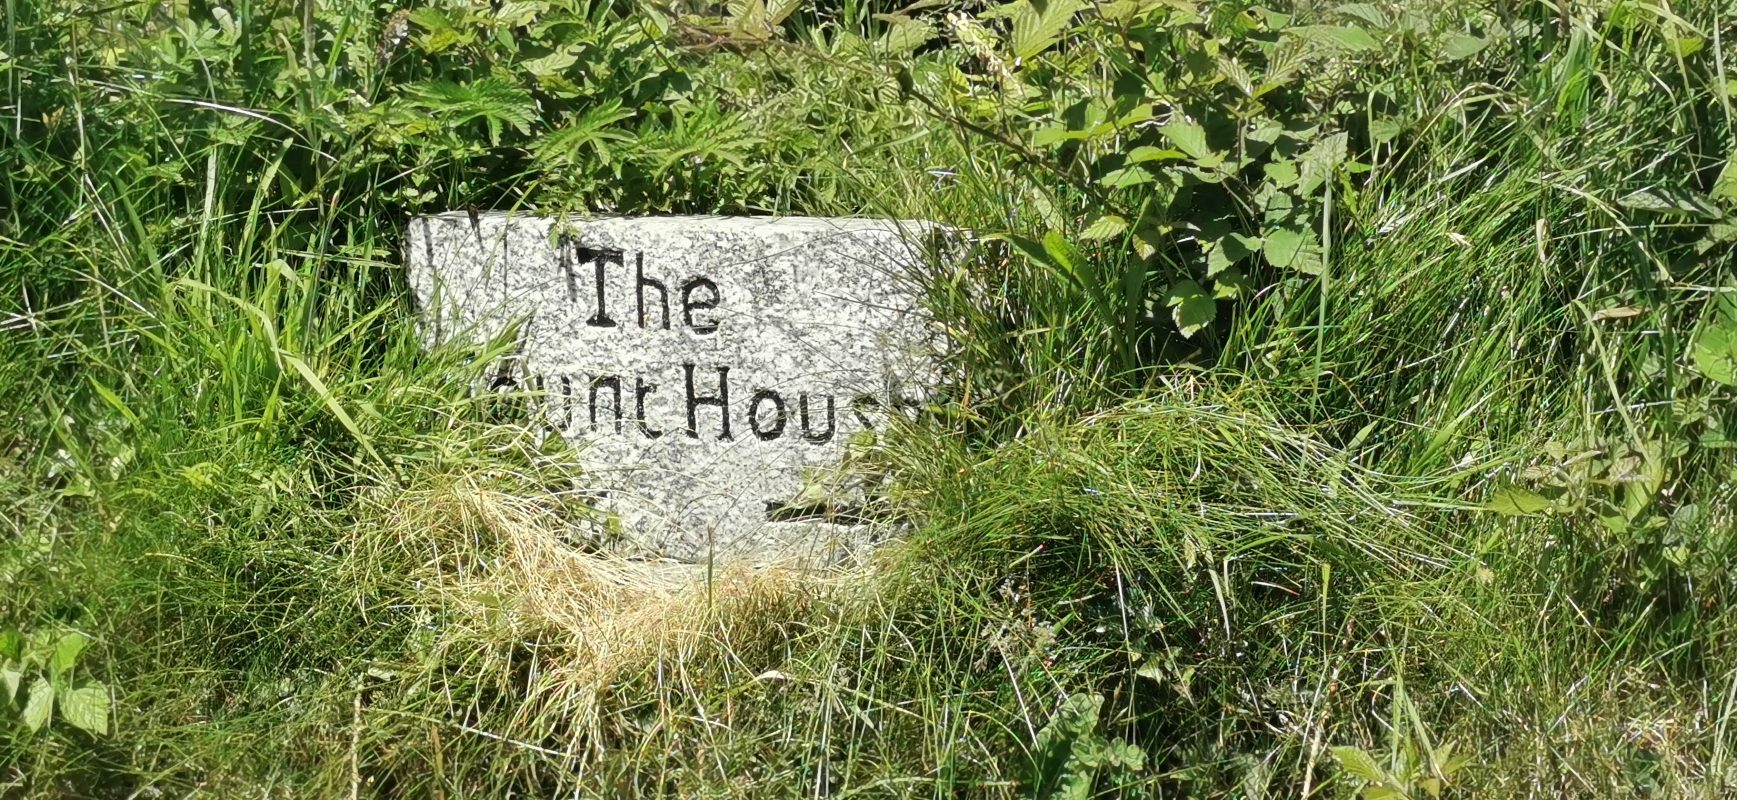 One of Alexander Boris De Pfeffel Johnsons holiday homes?